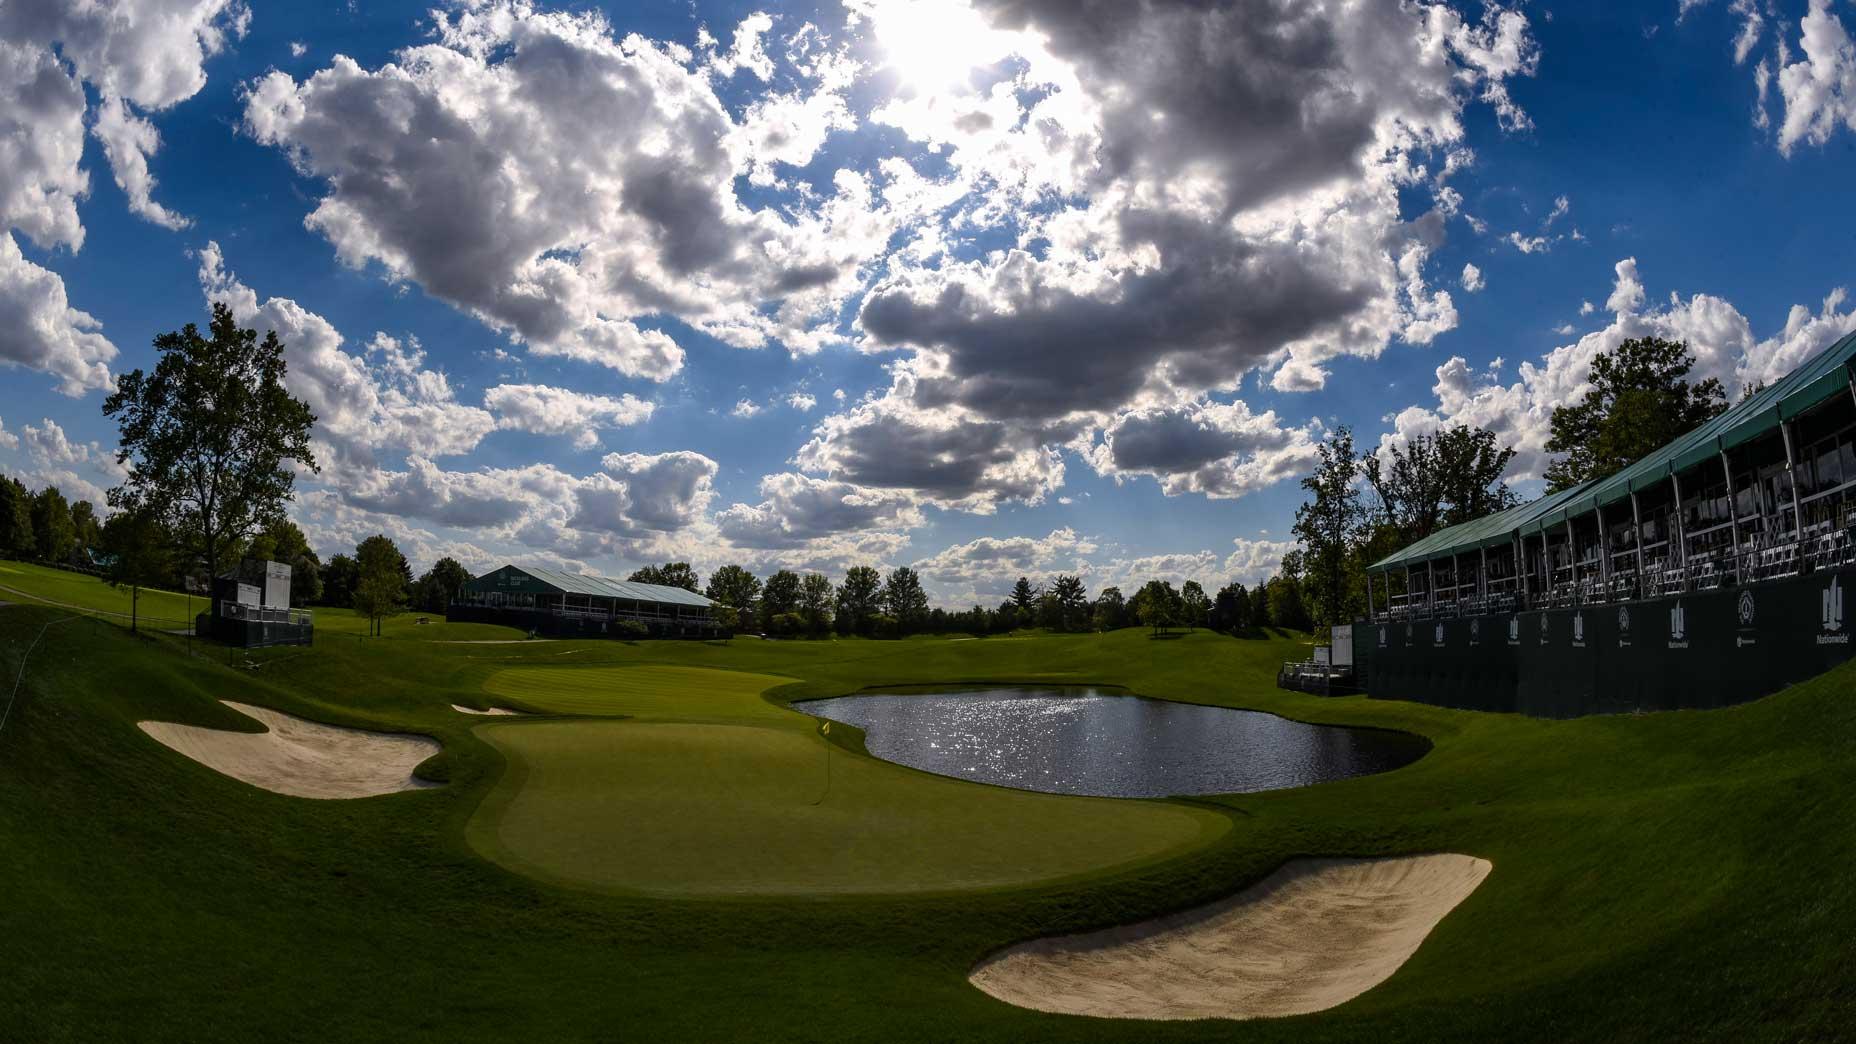 The par-3 16th hole at Muirfield Village Golf Club in 2017.